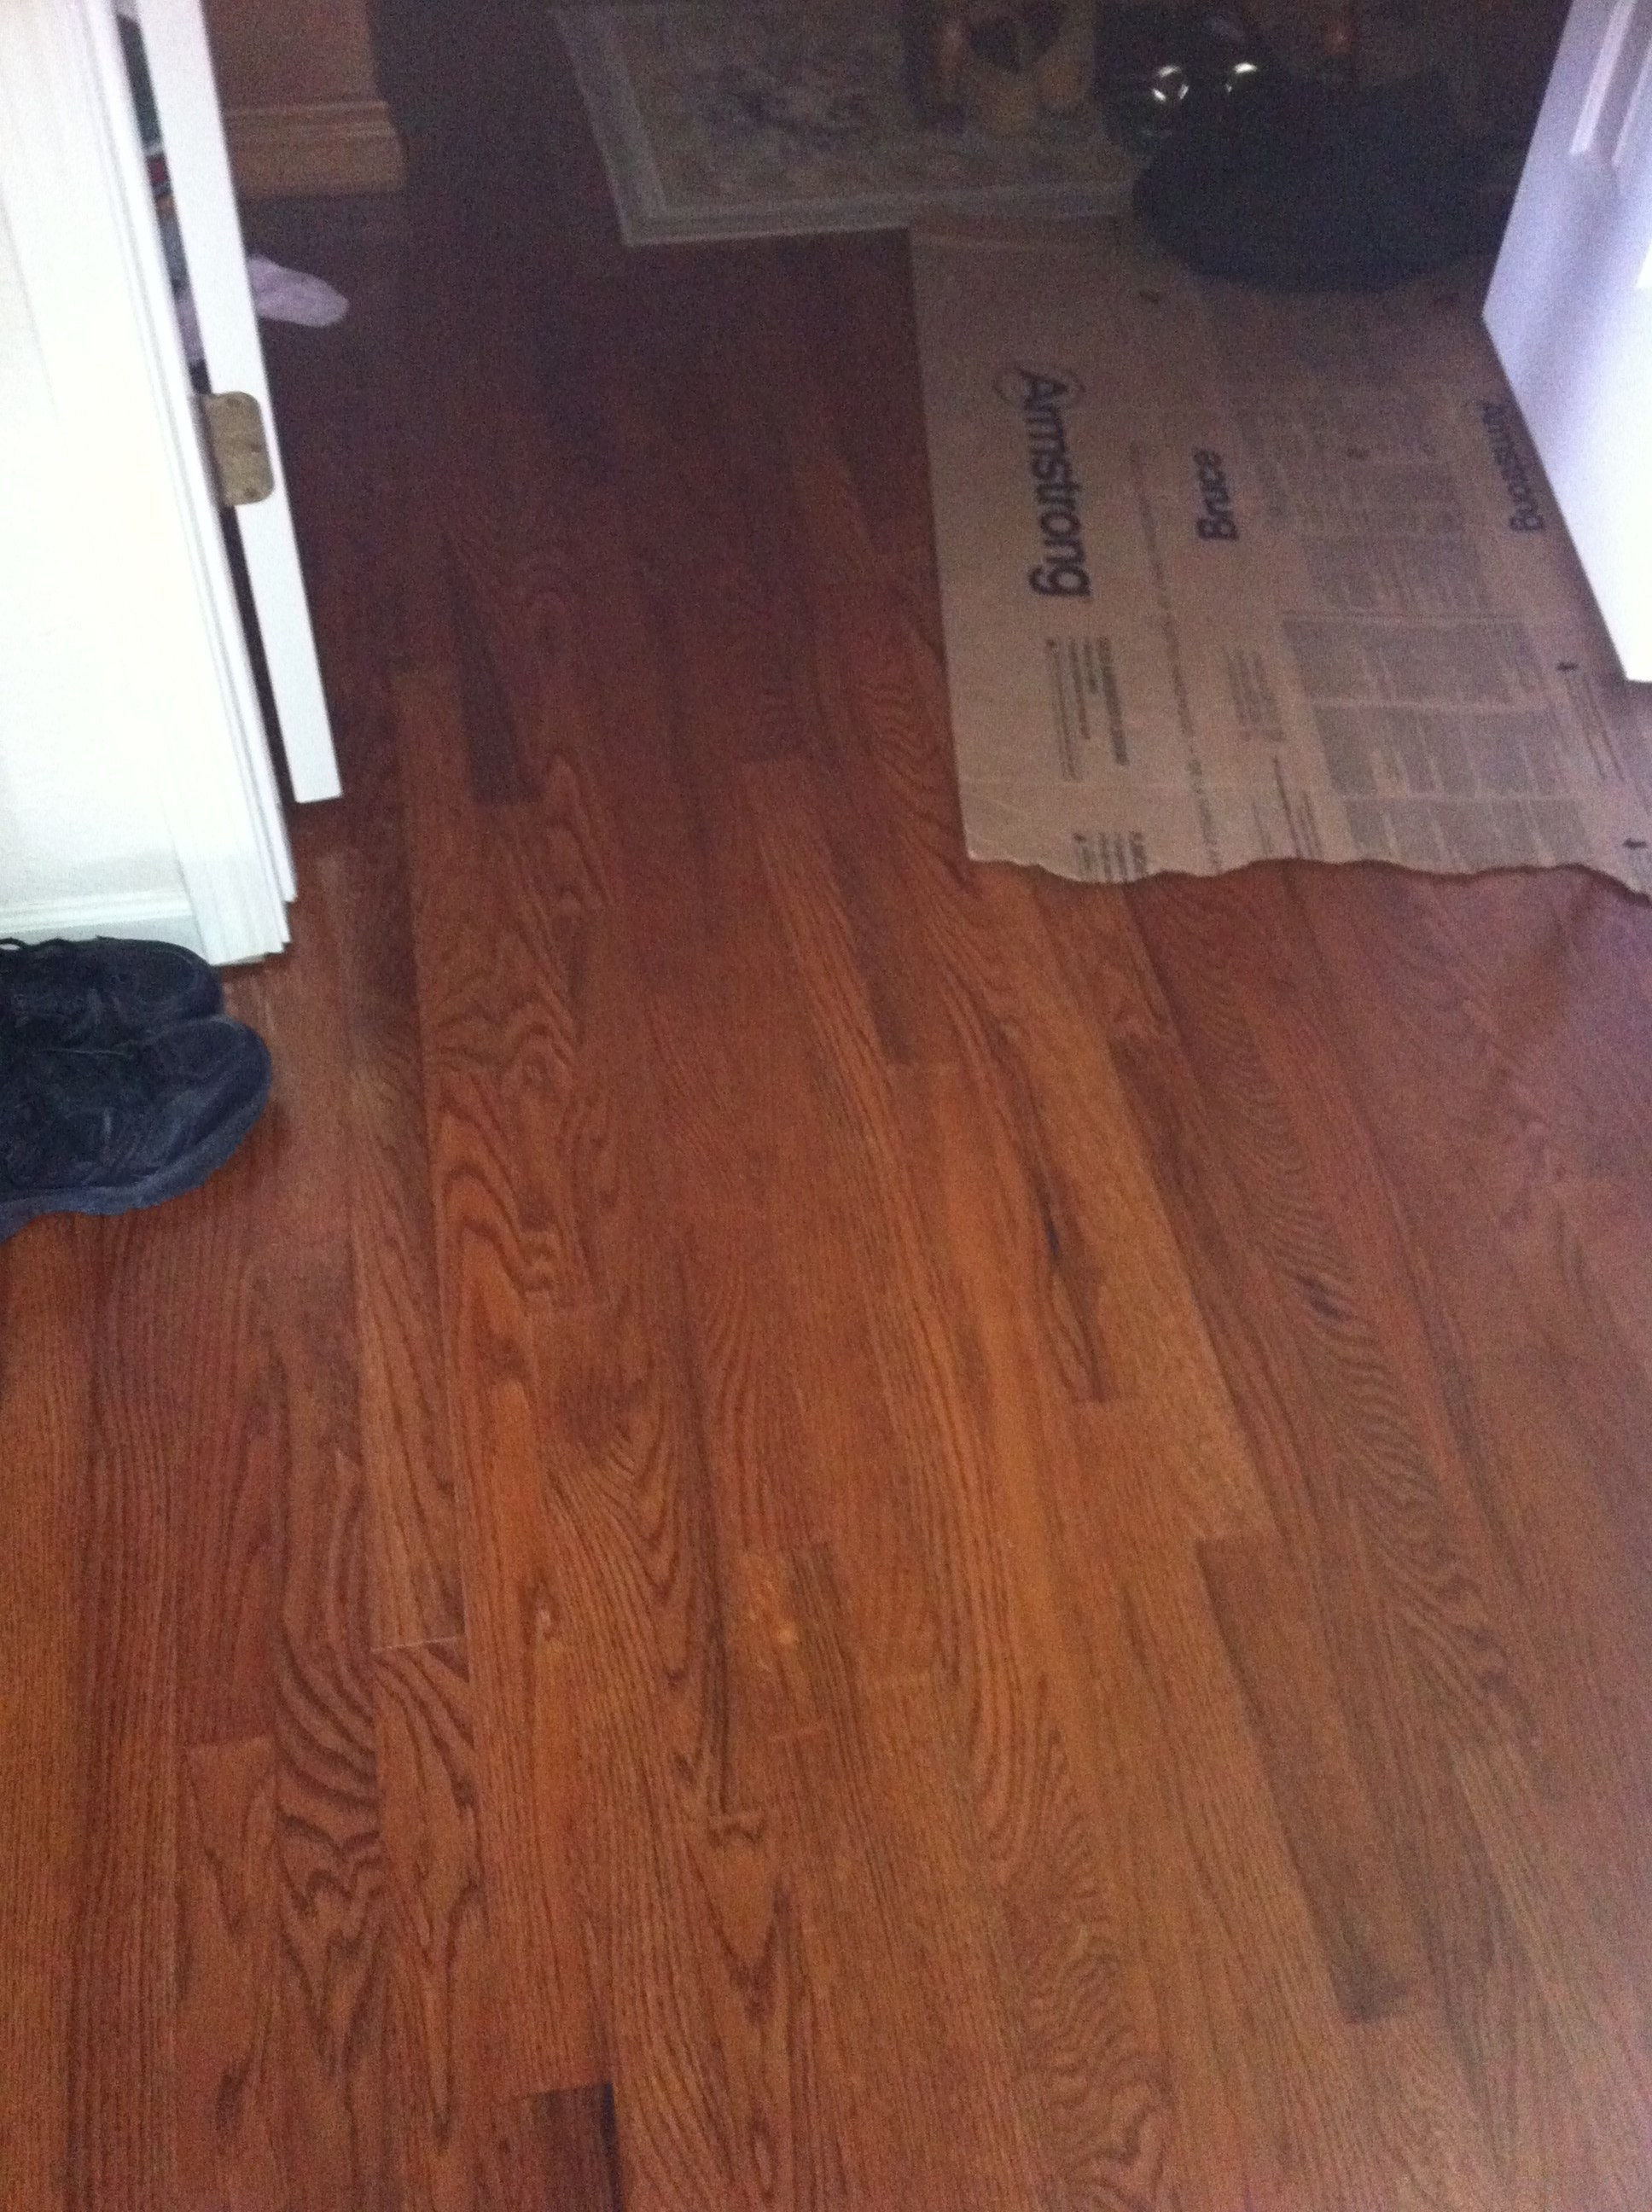 Hardwood Floor laced into existing floor